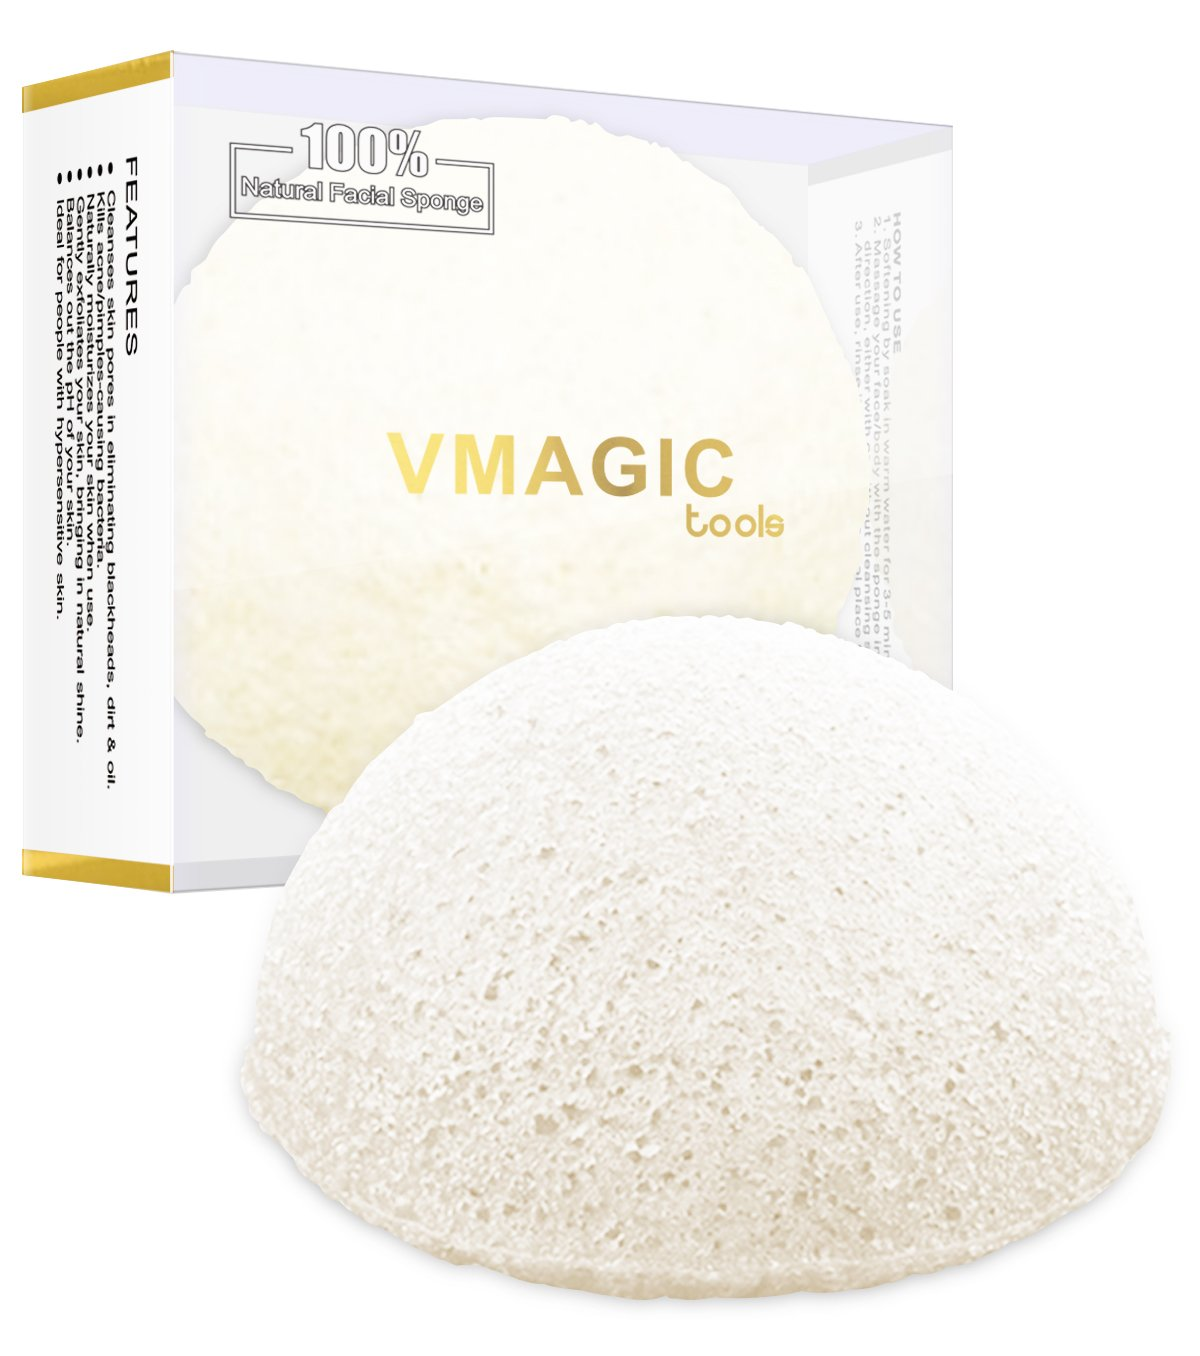 VMAGIC bambú natural Konjac Esponja - Unidades 100% Natural, fibra de verduras para la mejor Limpieza Facial Belleza: Amazon.es: Belleza